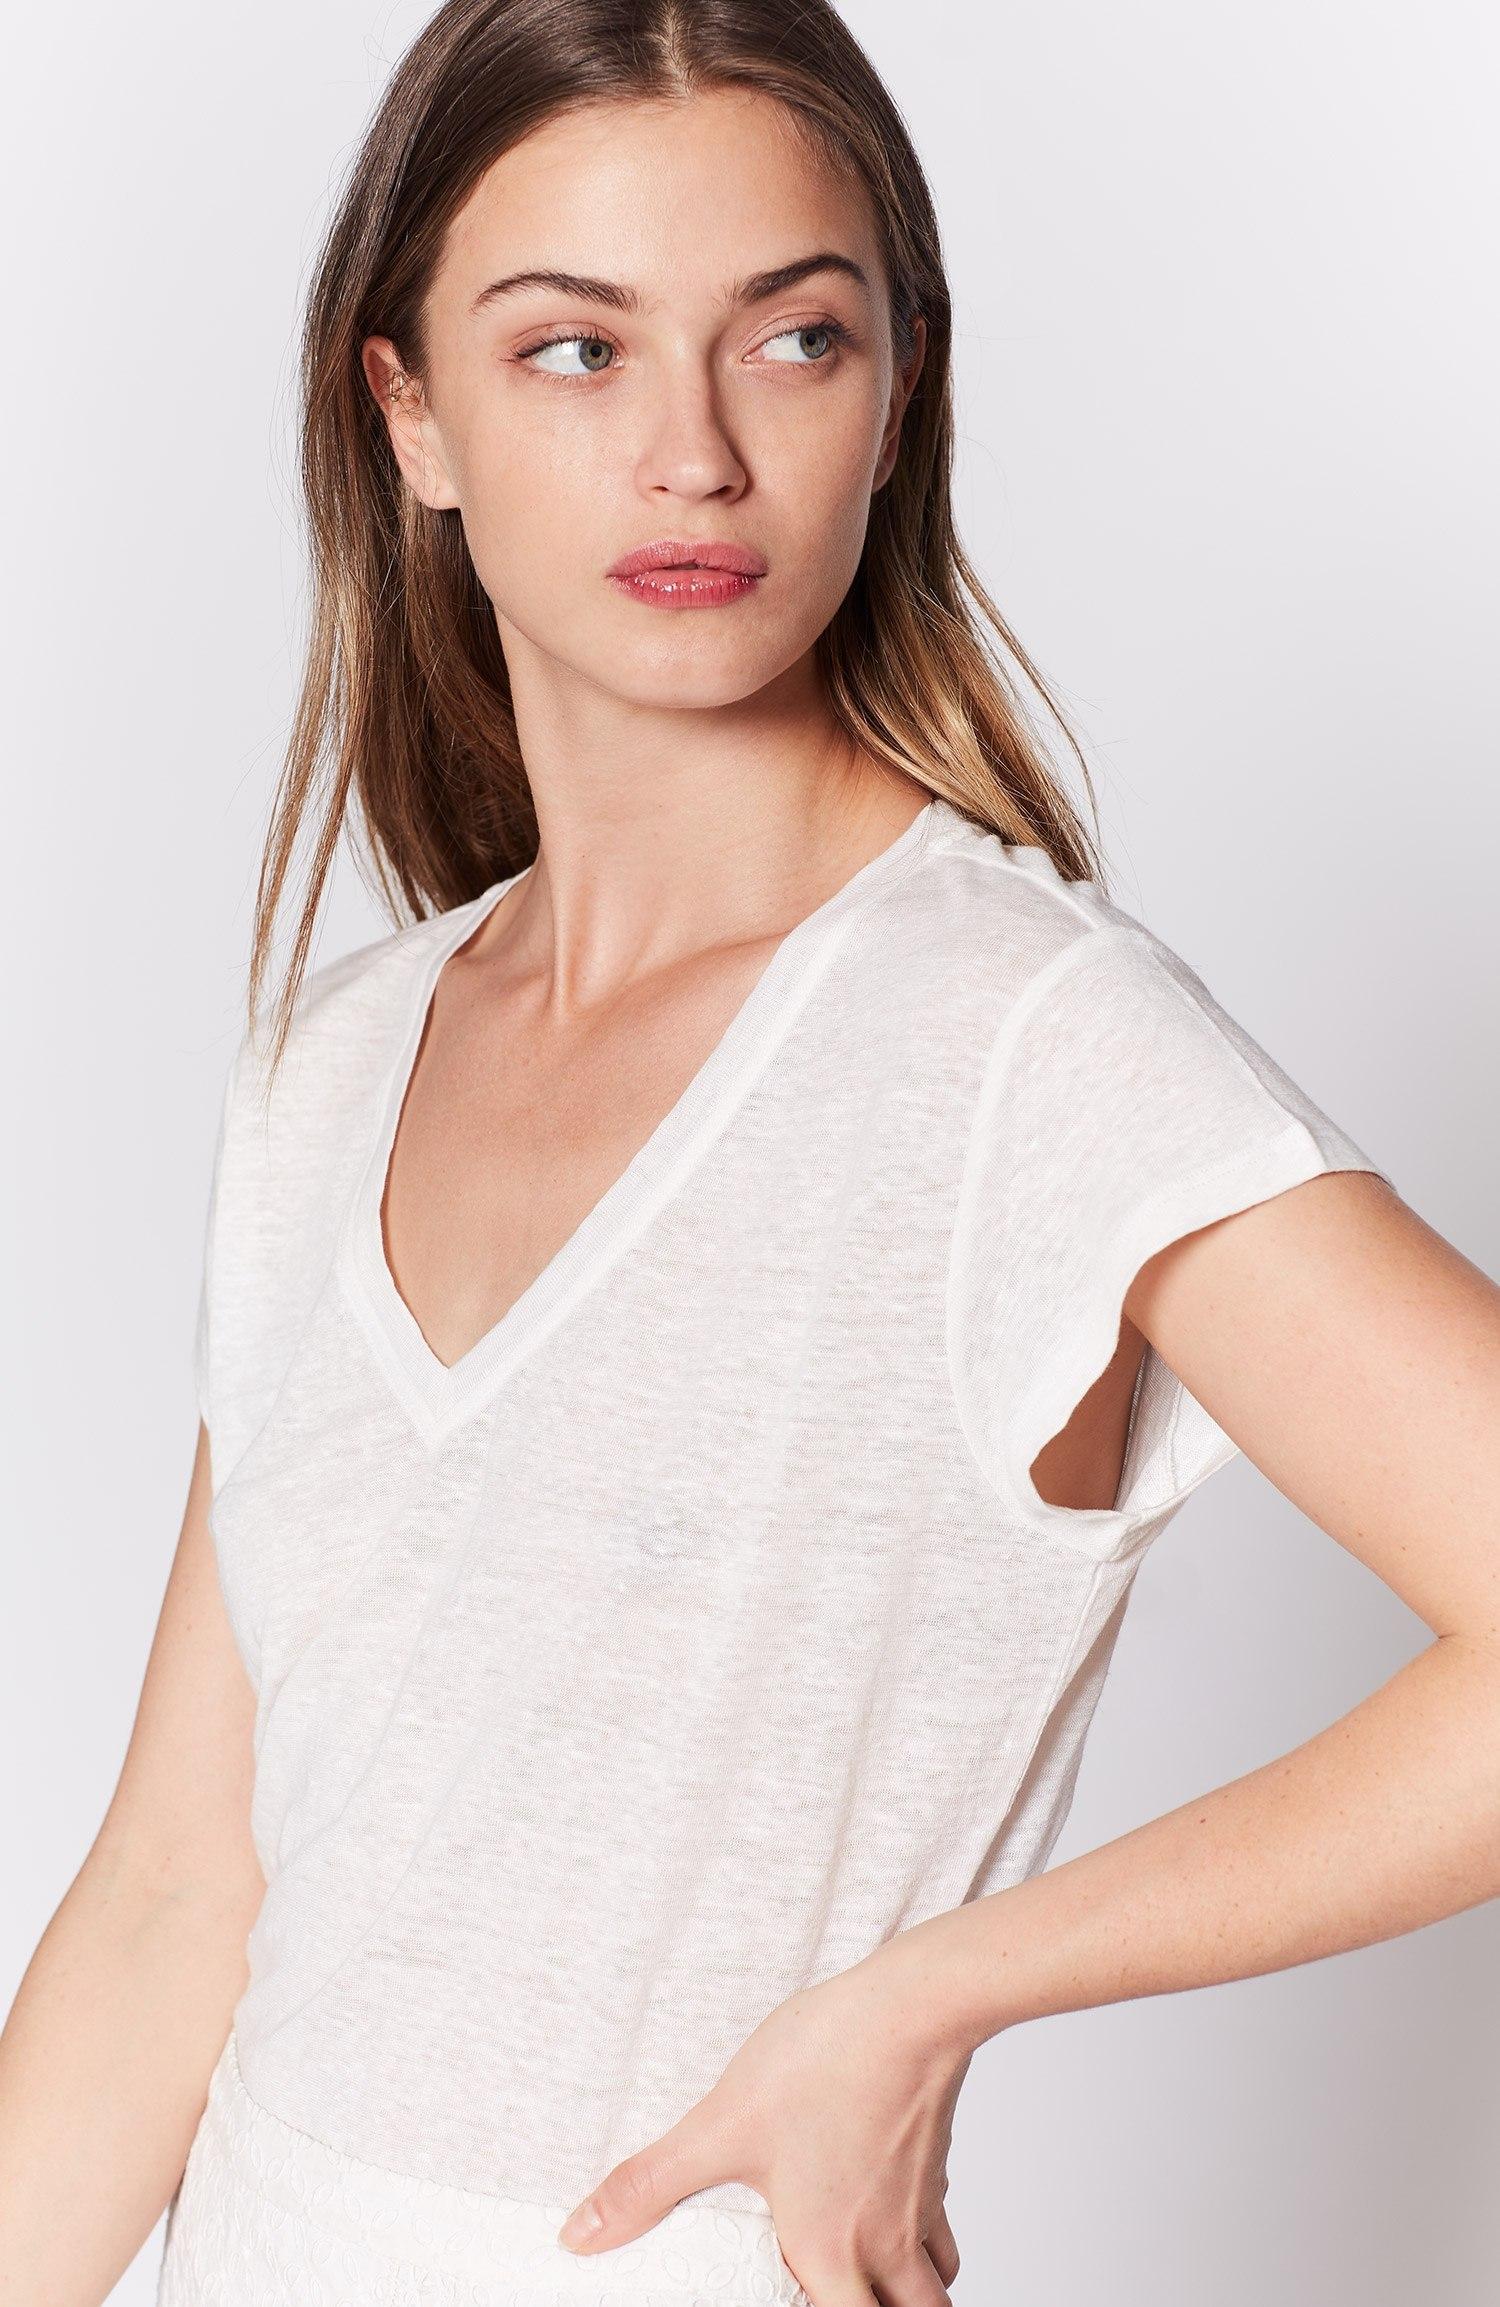 Joie Araceli T-shirt In Porcelain